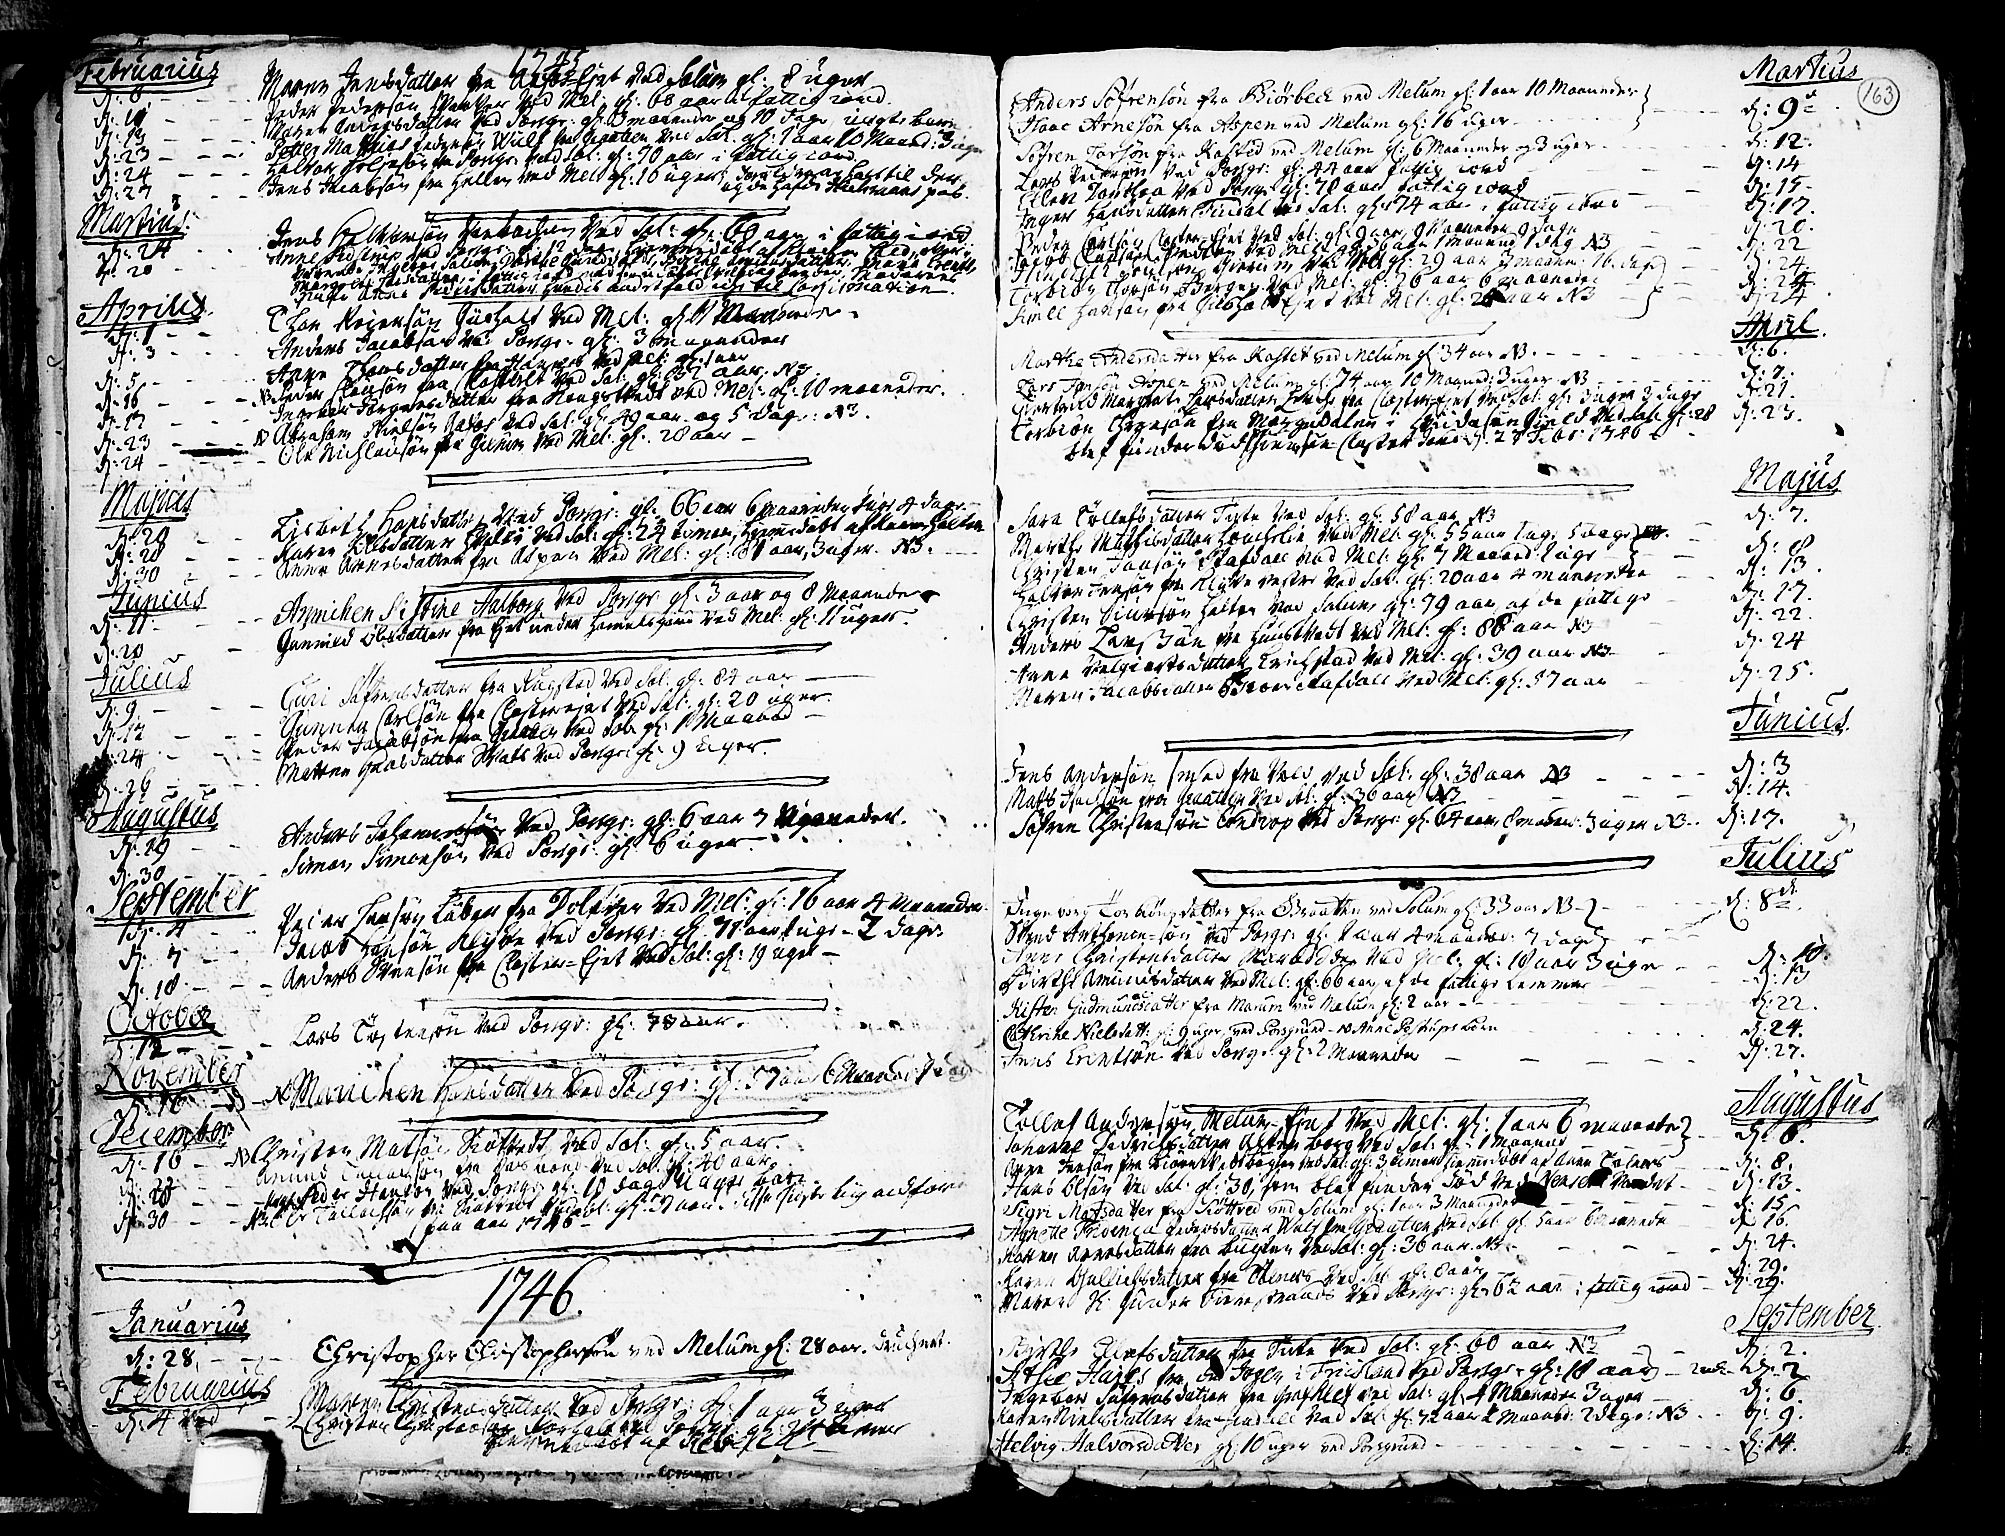 SAKO, Solum kirkebøker, F/Fa/L0002: Ministerialbok nr. I 2, 1713-1761, s. 163